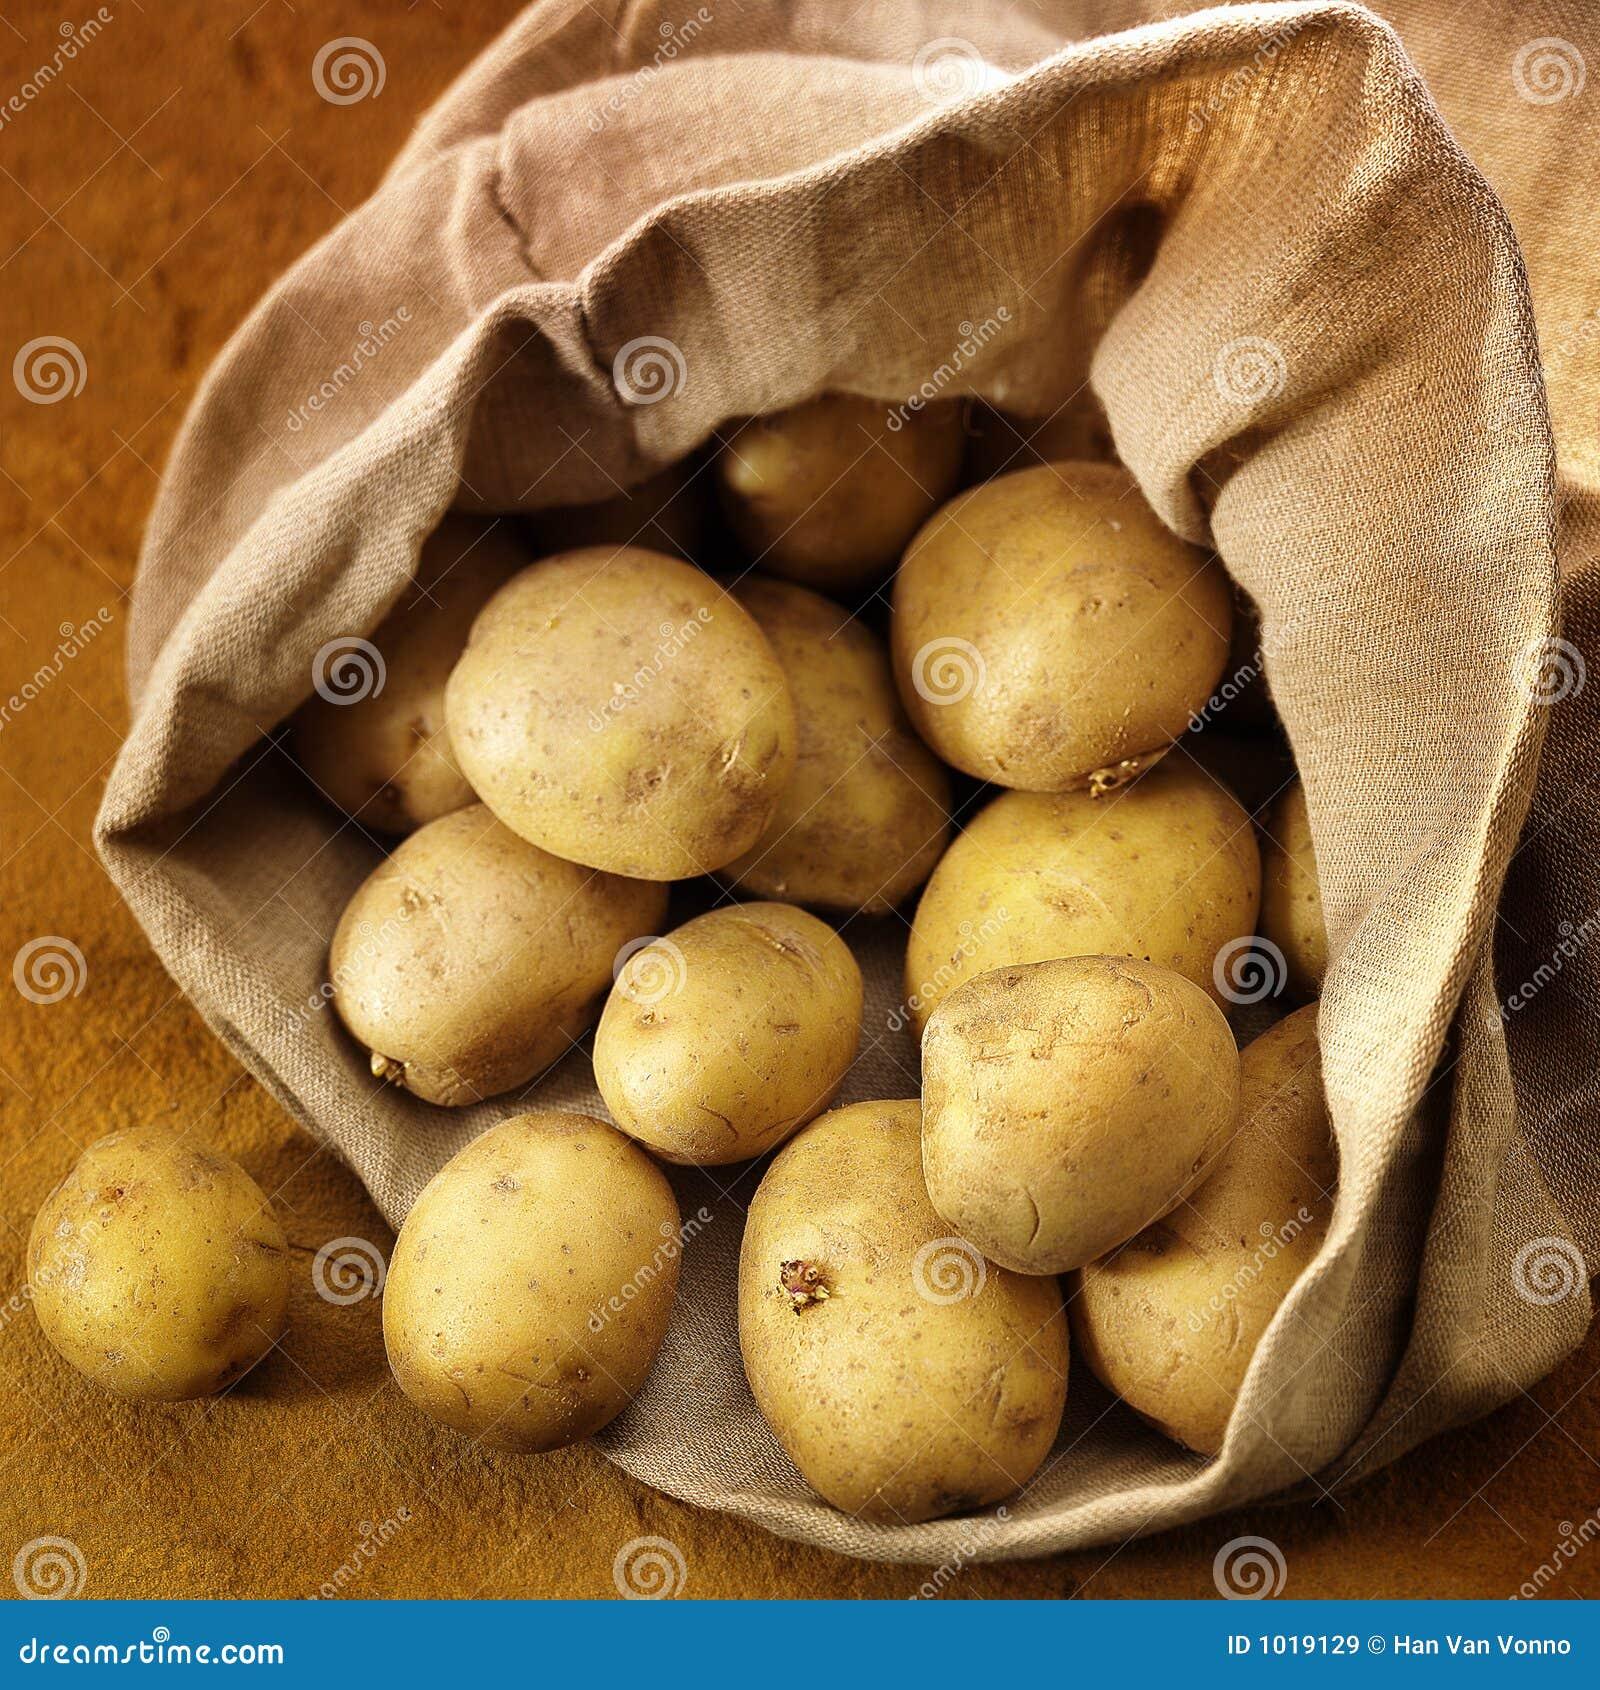 Overlopende zak van potatos